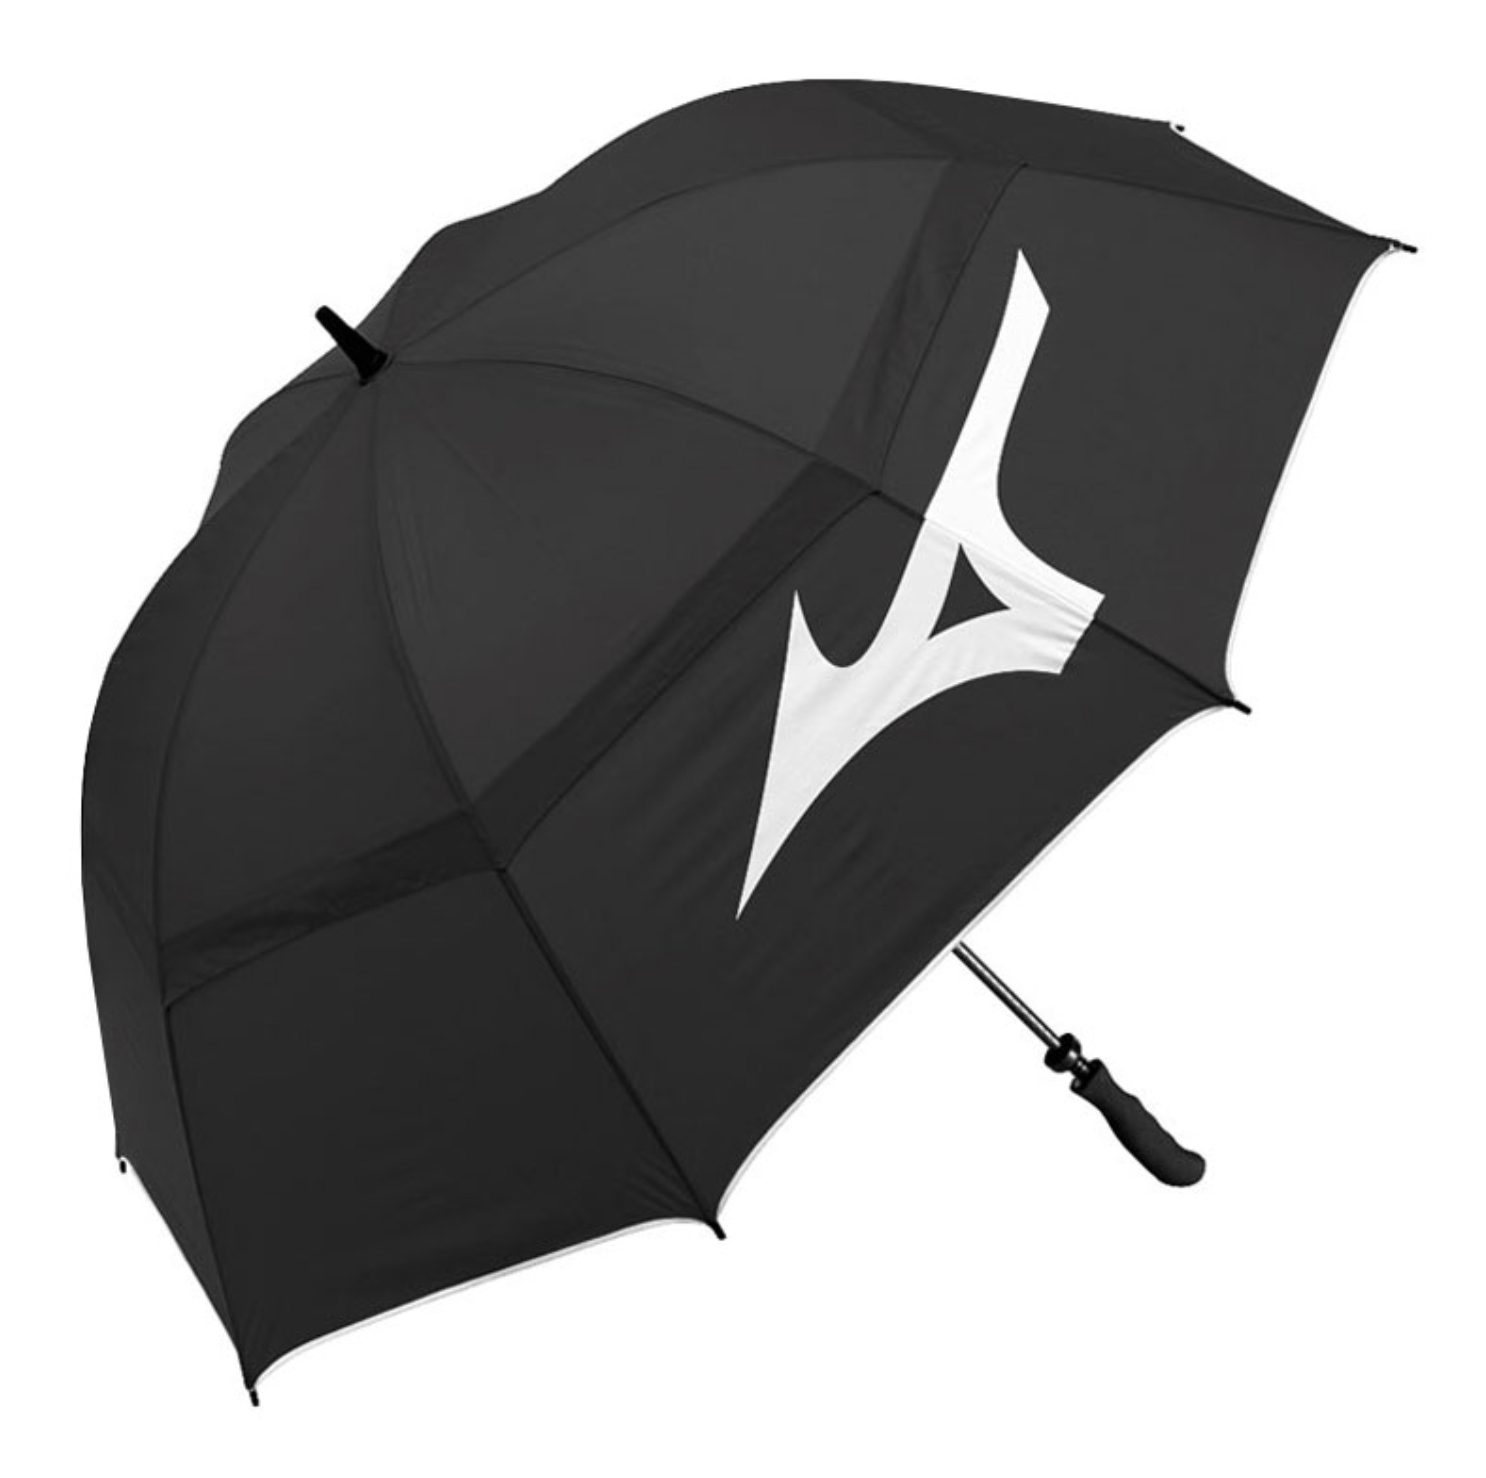 Mizuno Mizuno Tour Twin Canopy Golf Paraplu, Zwart